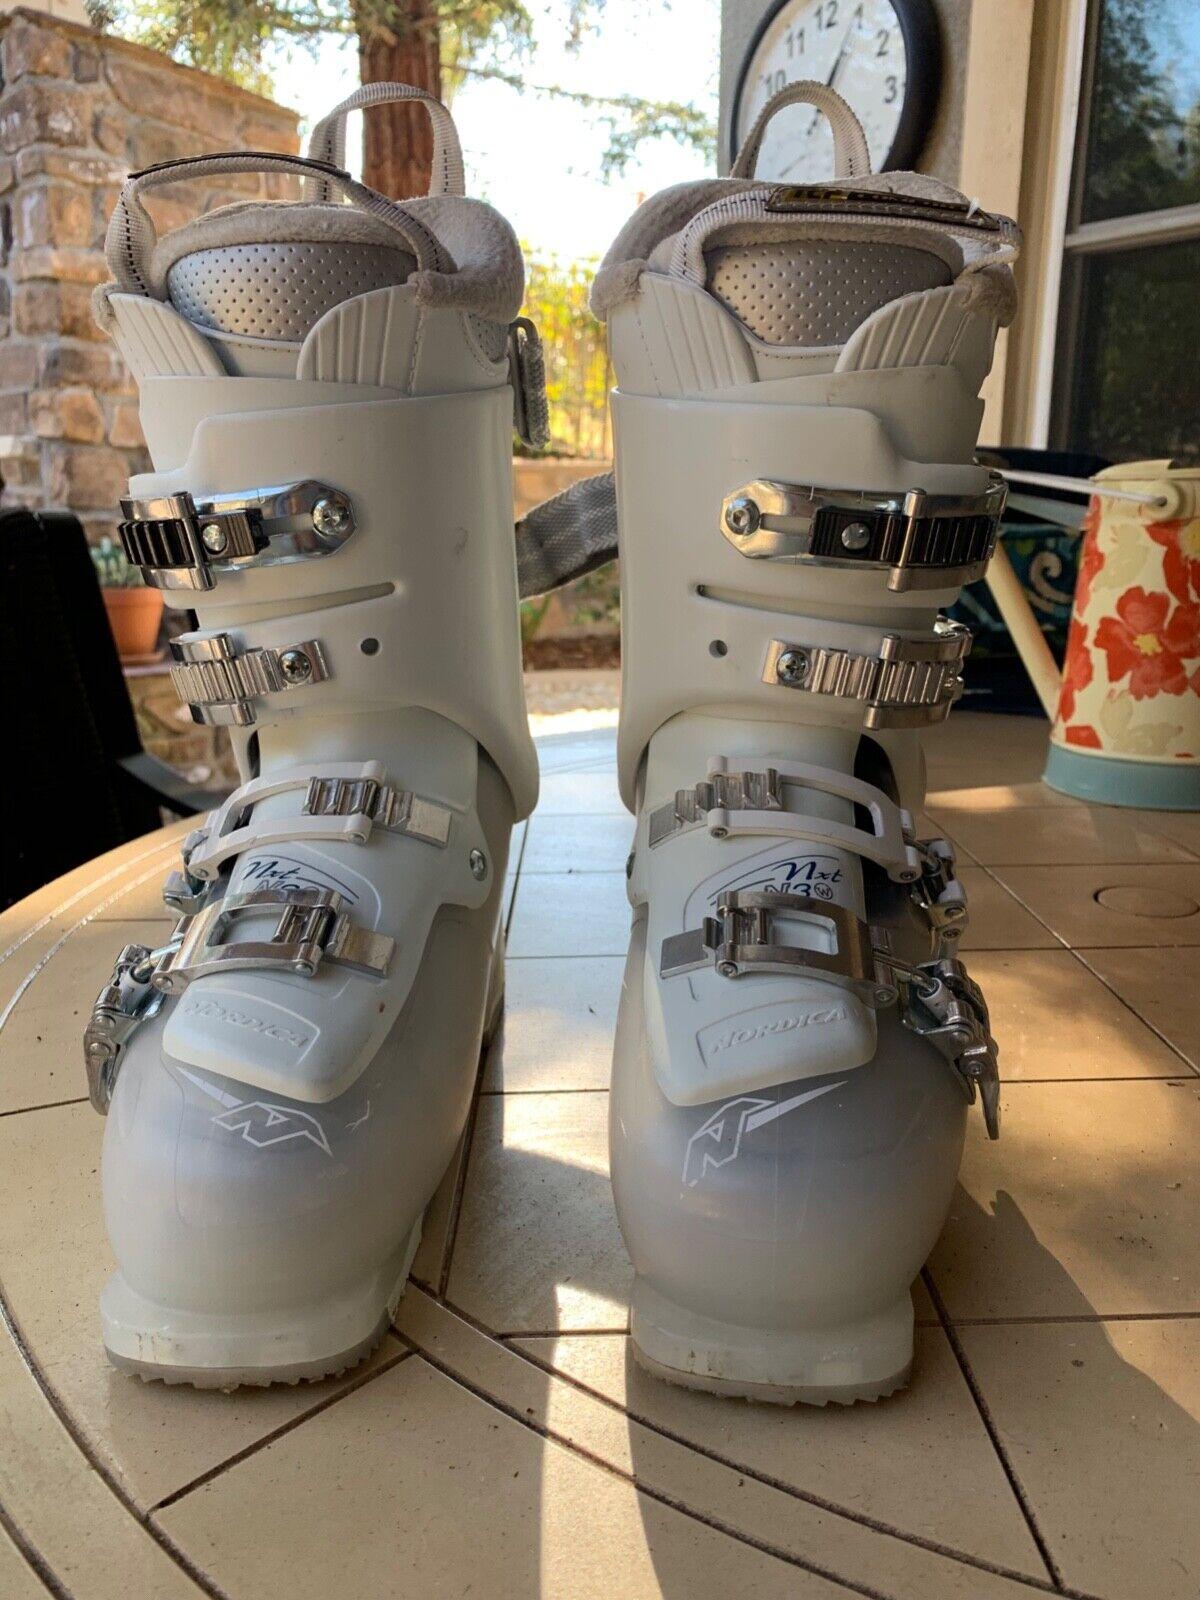 Woman's Nordica Ski Boots, size 23.5, 275 mm